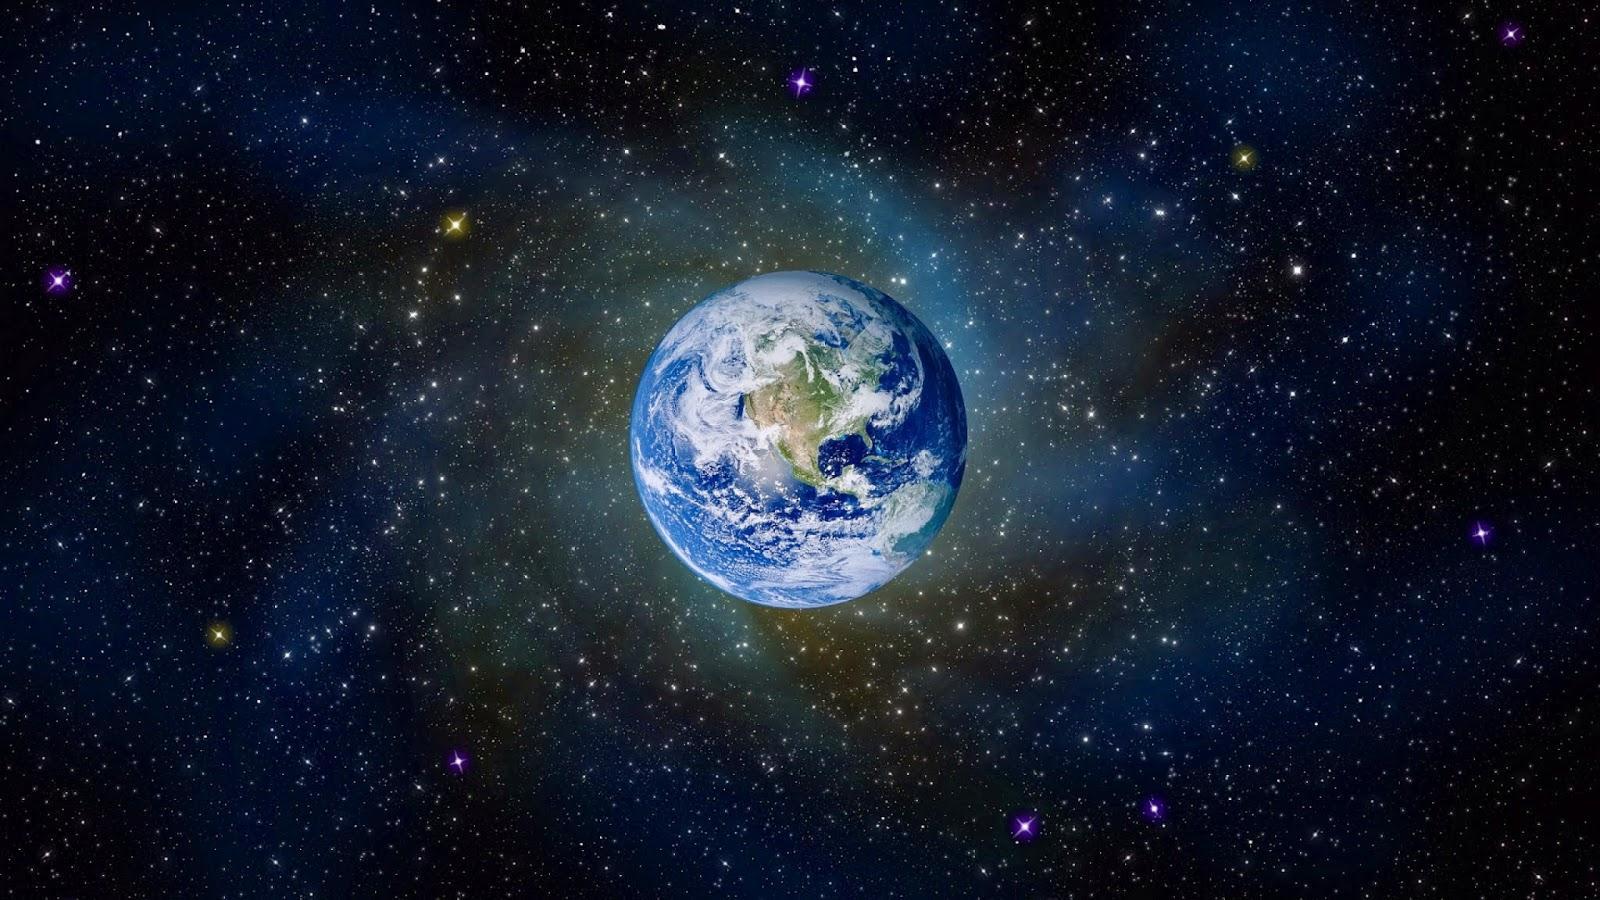 http://www.mrwallpaper.com/wallpapers/new_tn2s/Earth-from-Space_tn2.jpg